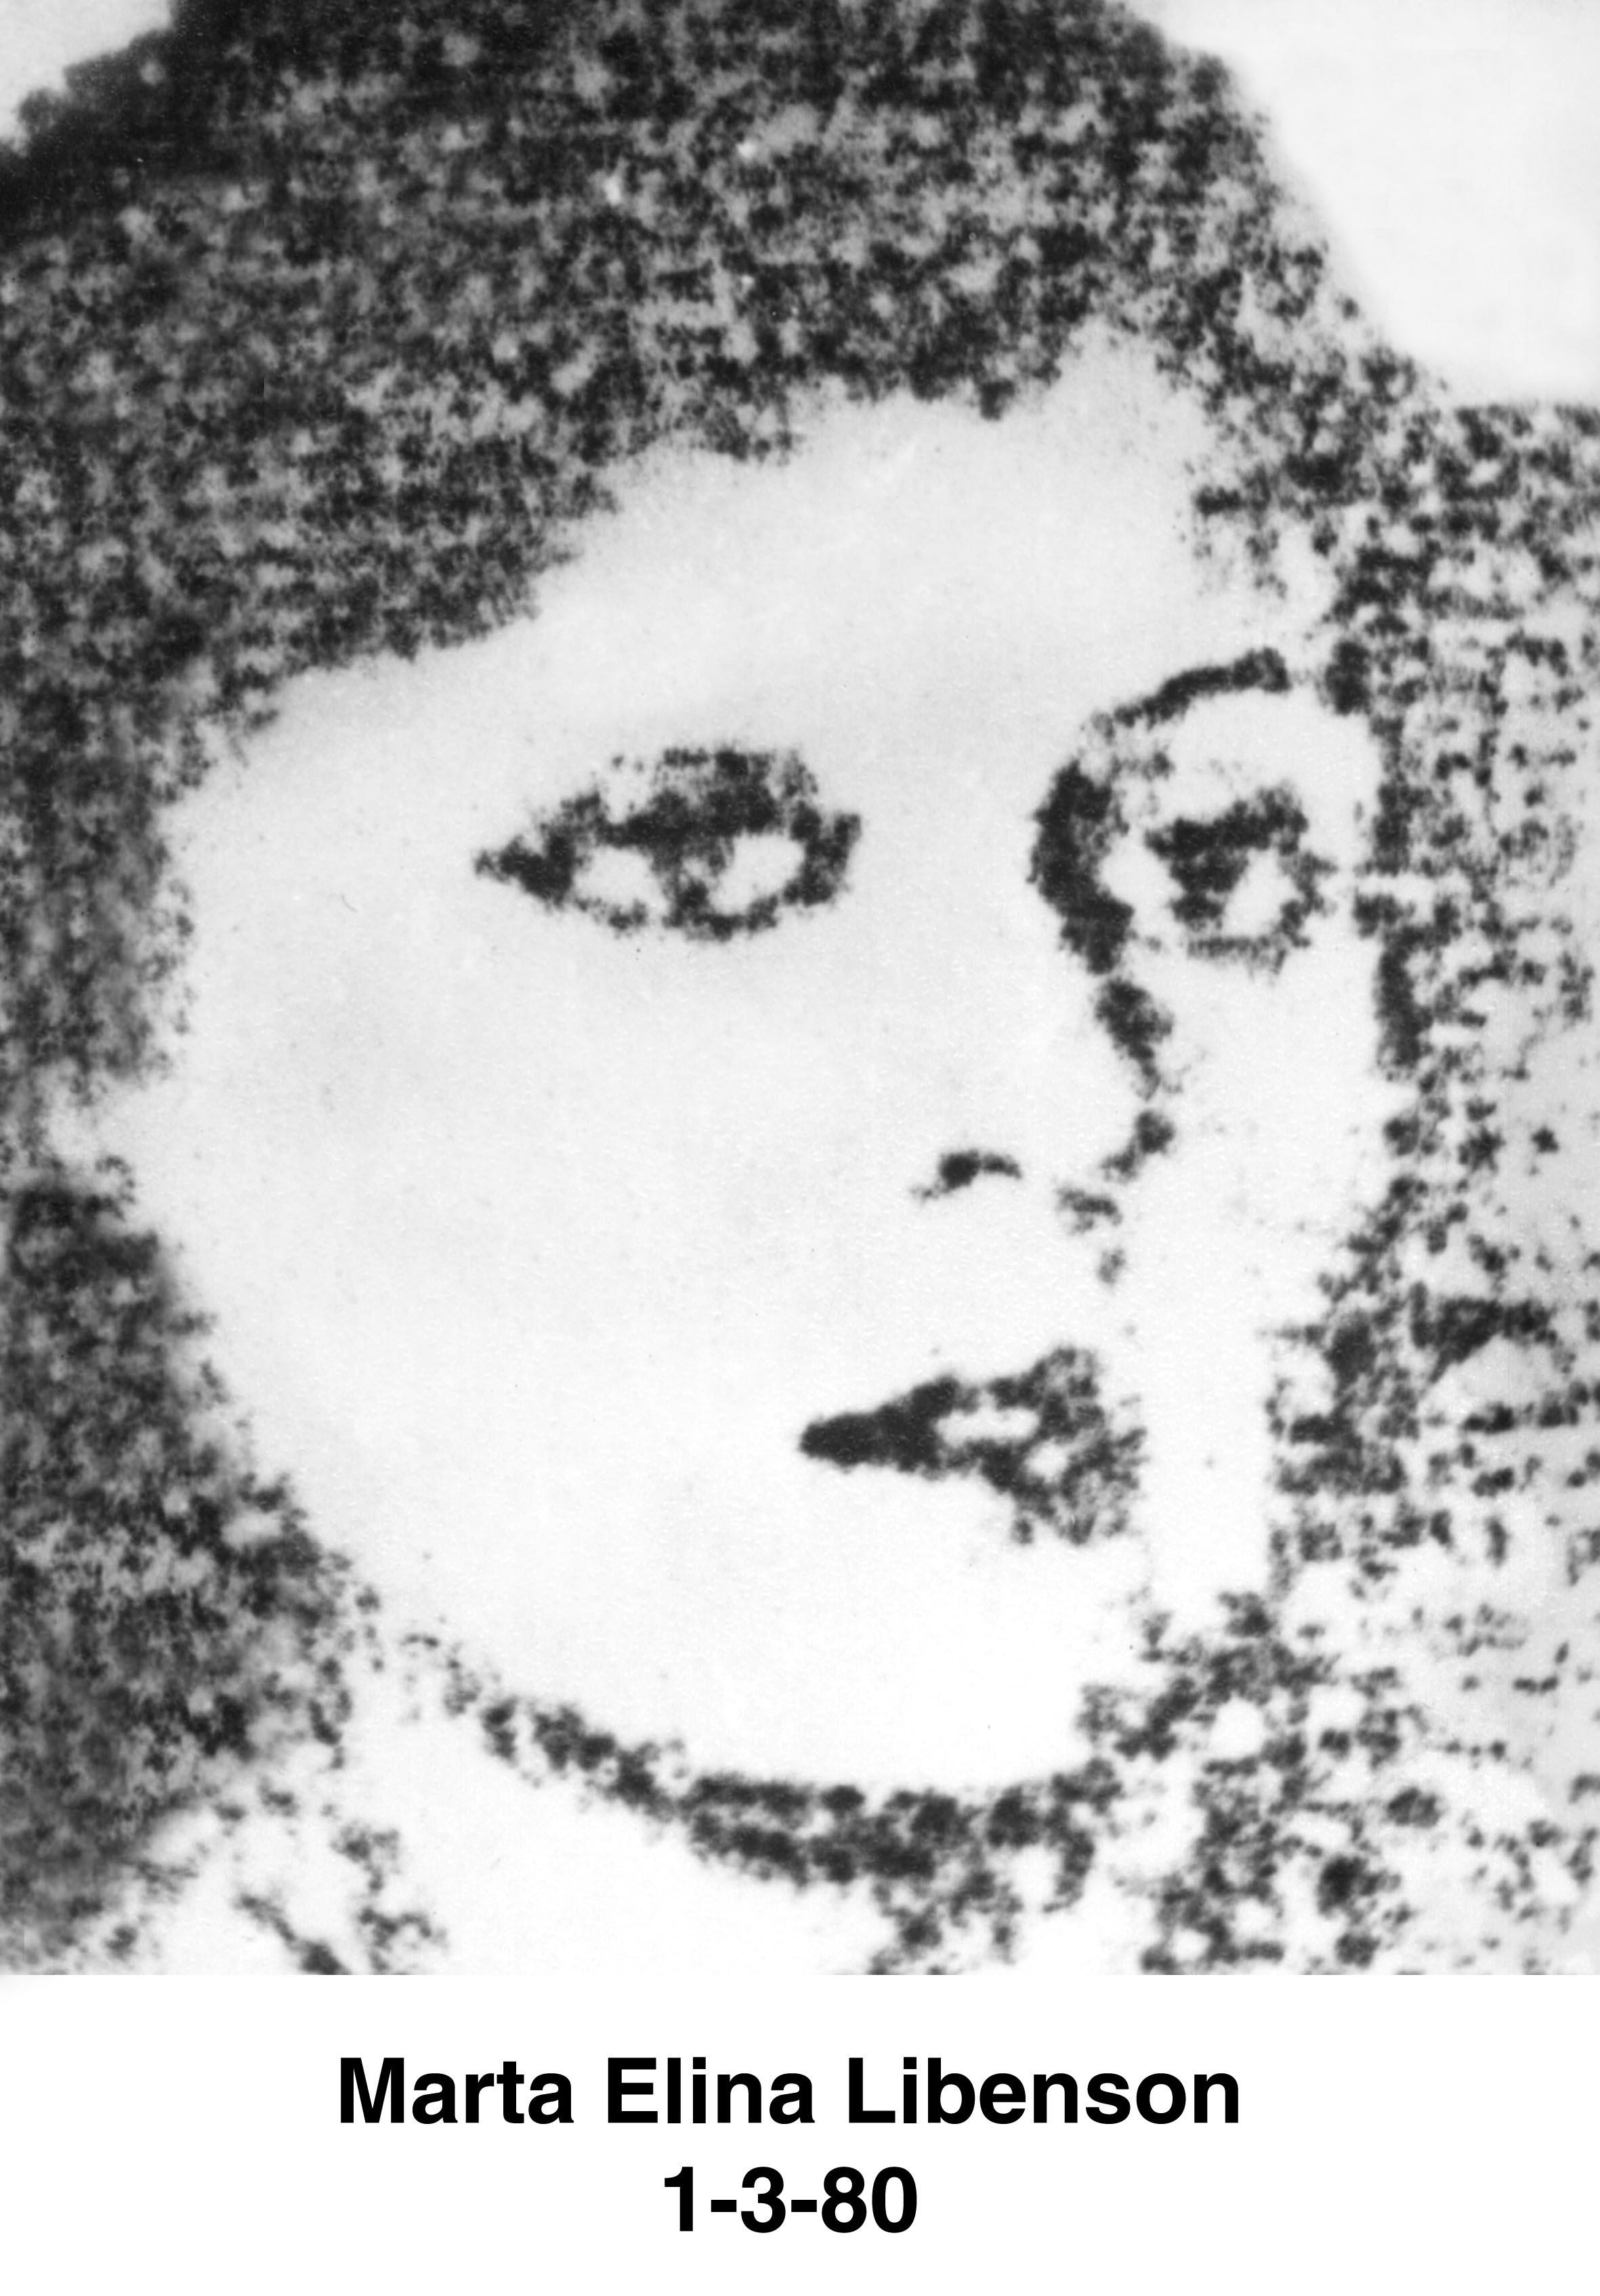 Libenson, Marta Elina - LIBENSON_MARTA_ELIANA_1